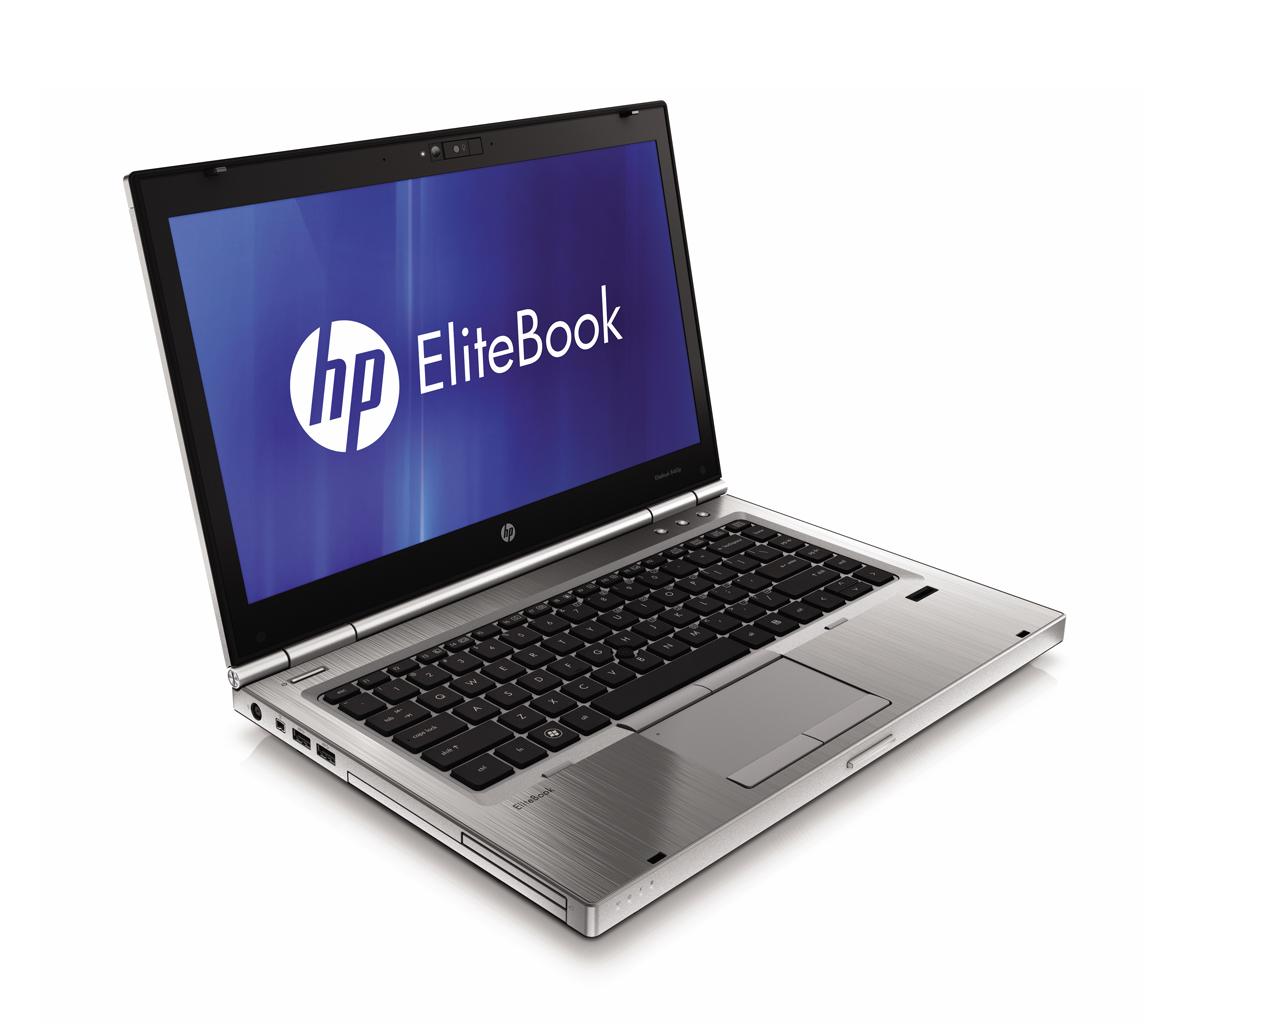 Overclock Computers Products Hp Elitebook 8460p